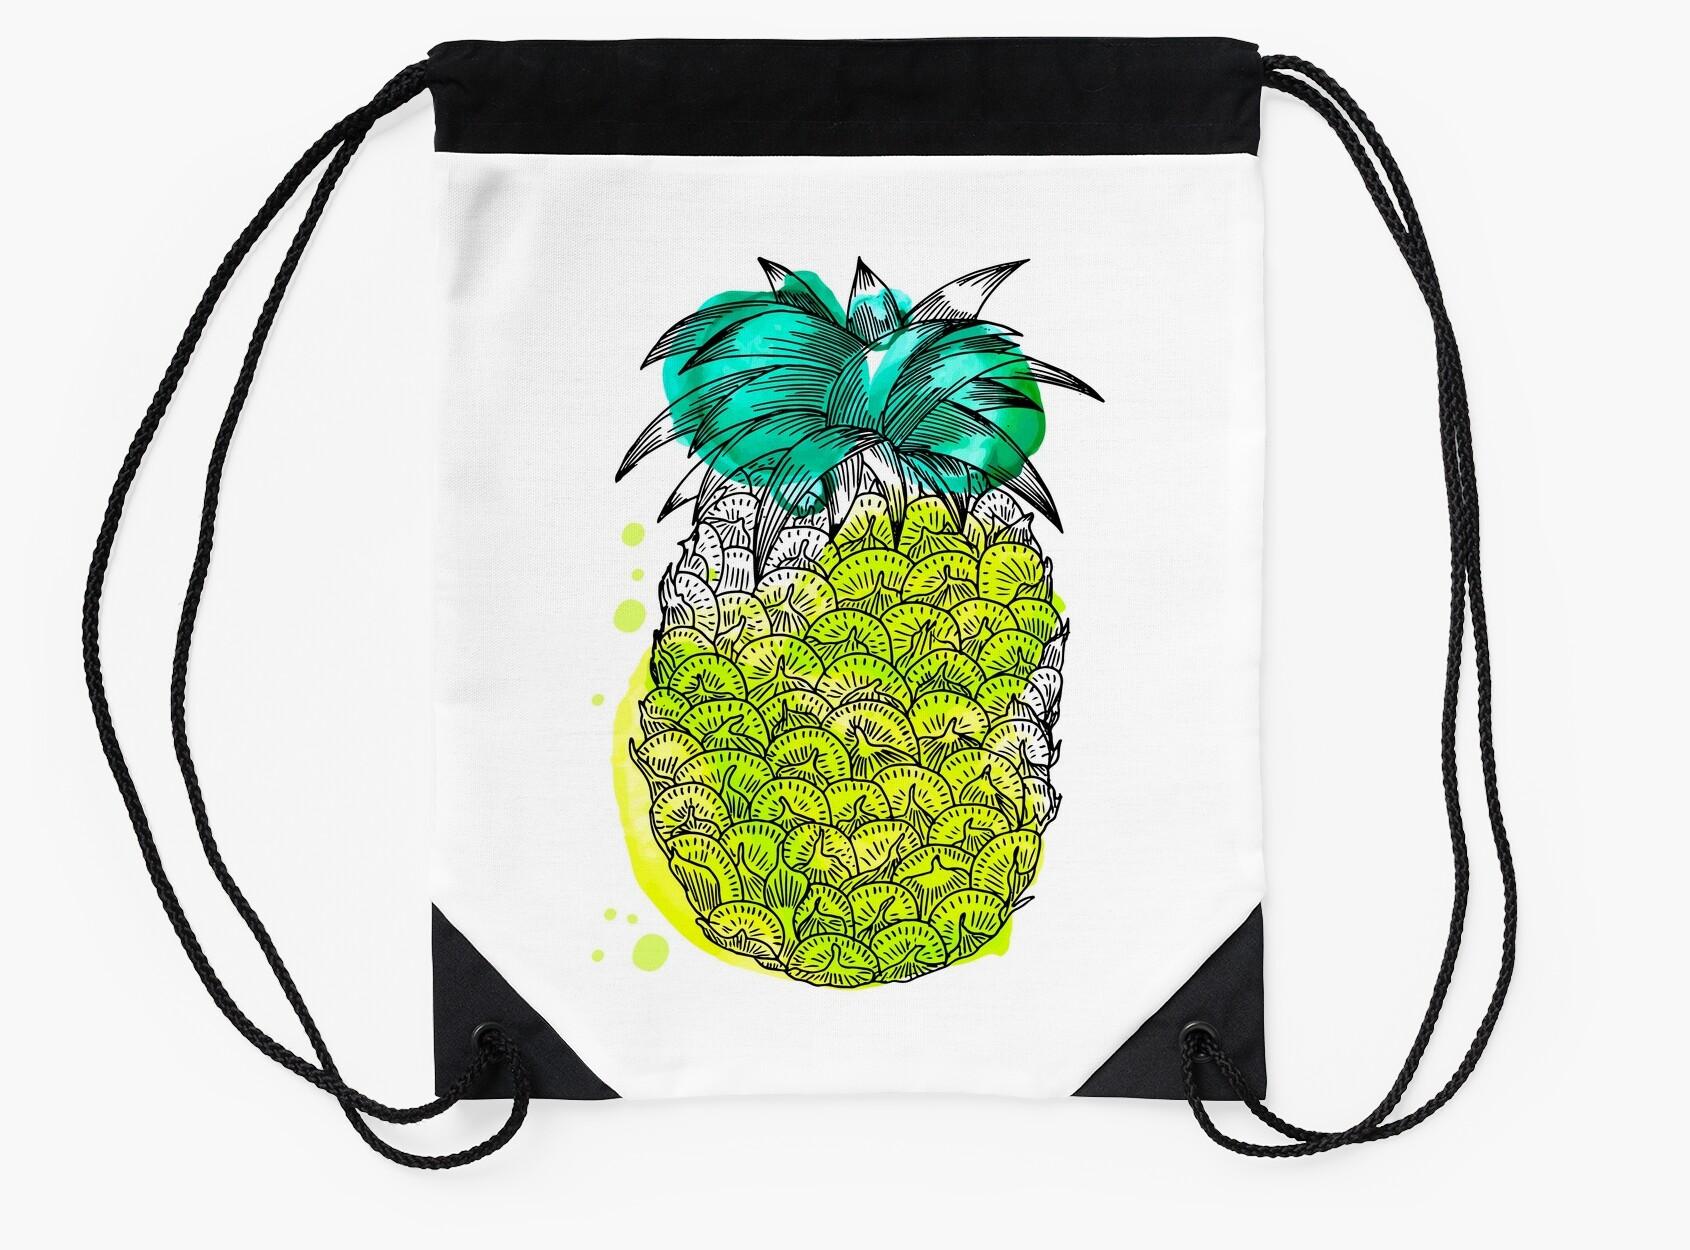 Fruit splash classic - Hand Drawn Tropical Fruit With Watercolour Splash